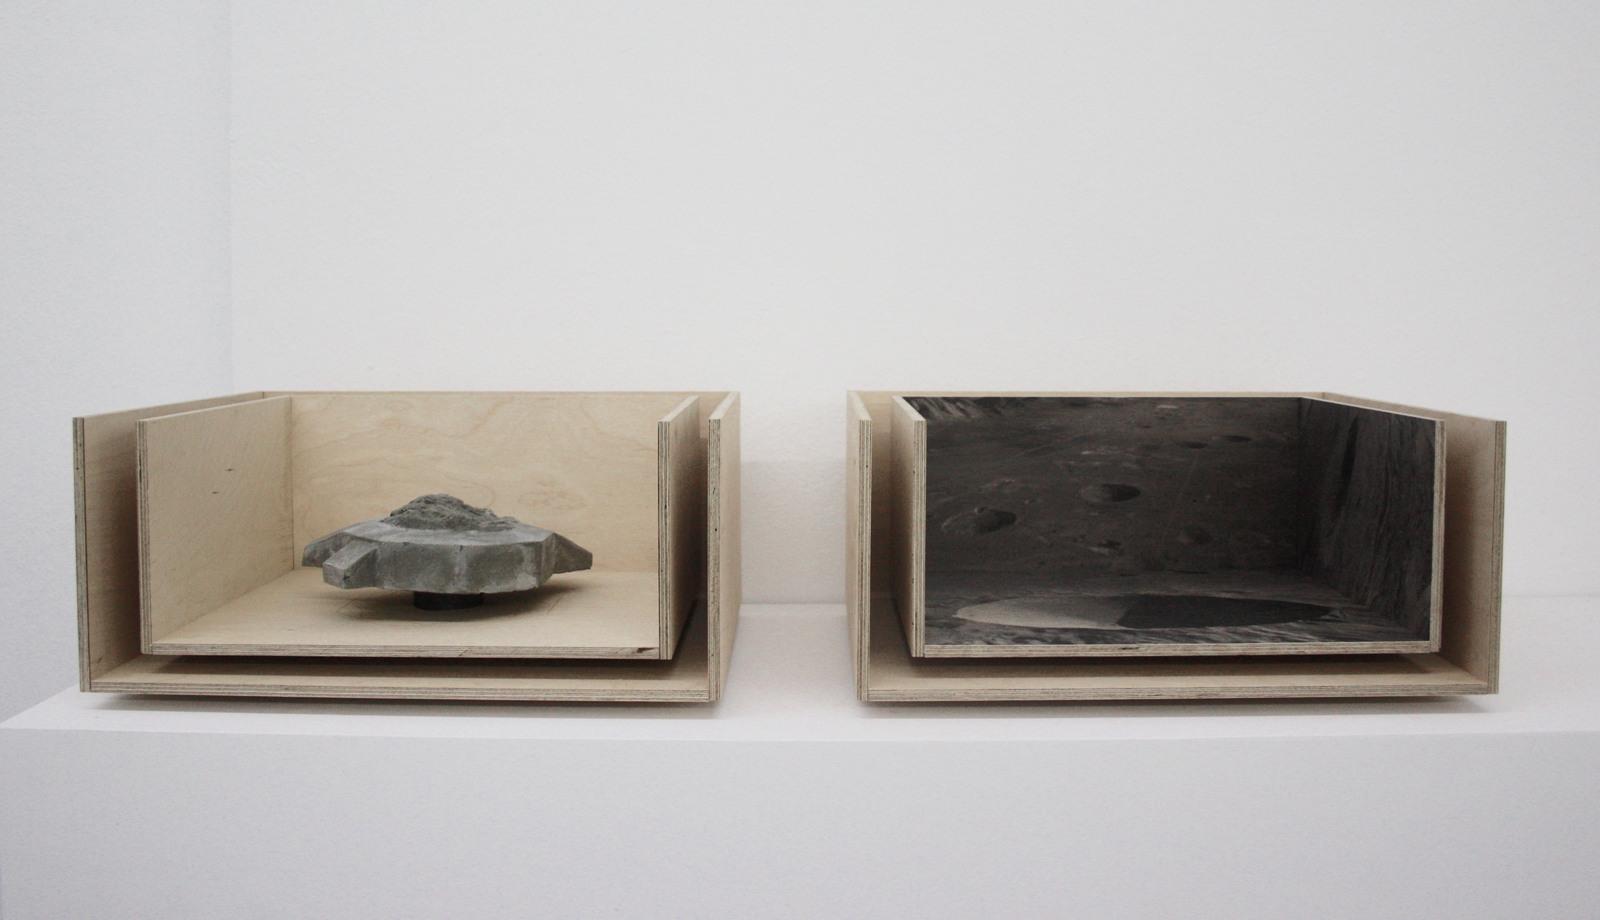 Katleen Vinck, f4.69, f4.65, installation view